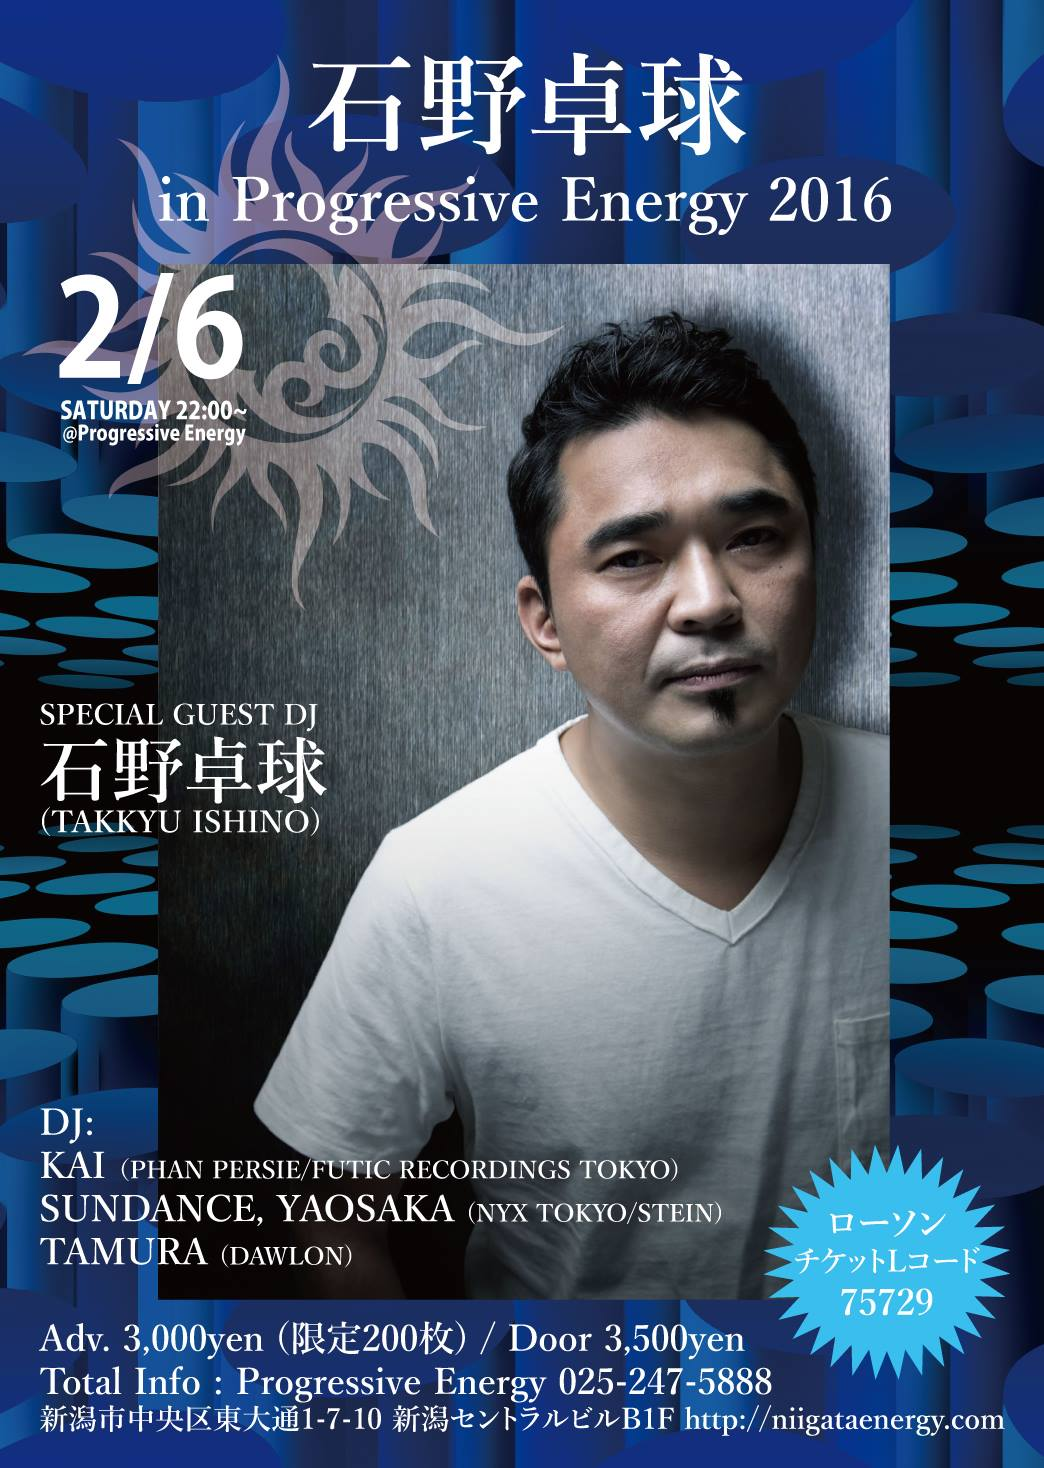 2016.2.6 SAT – KAI : DJ@Progressive Energy / Takkyu Ishino in P.E. 2016